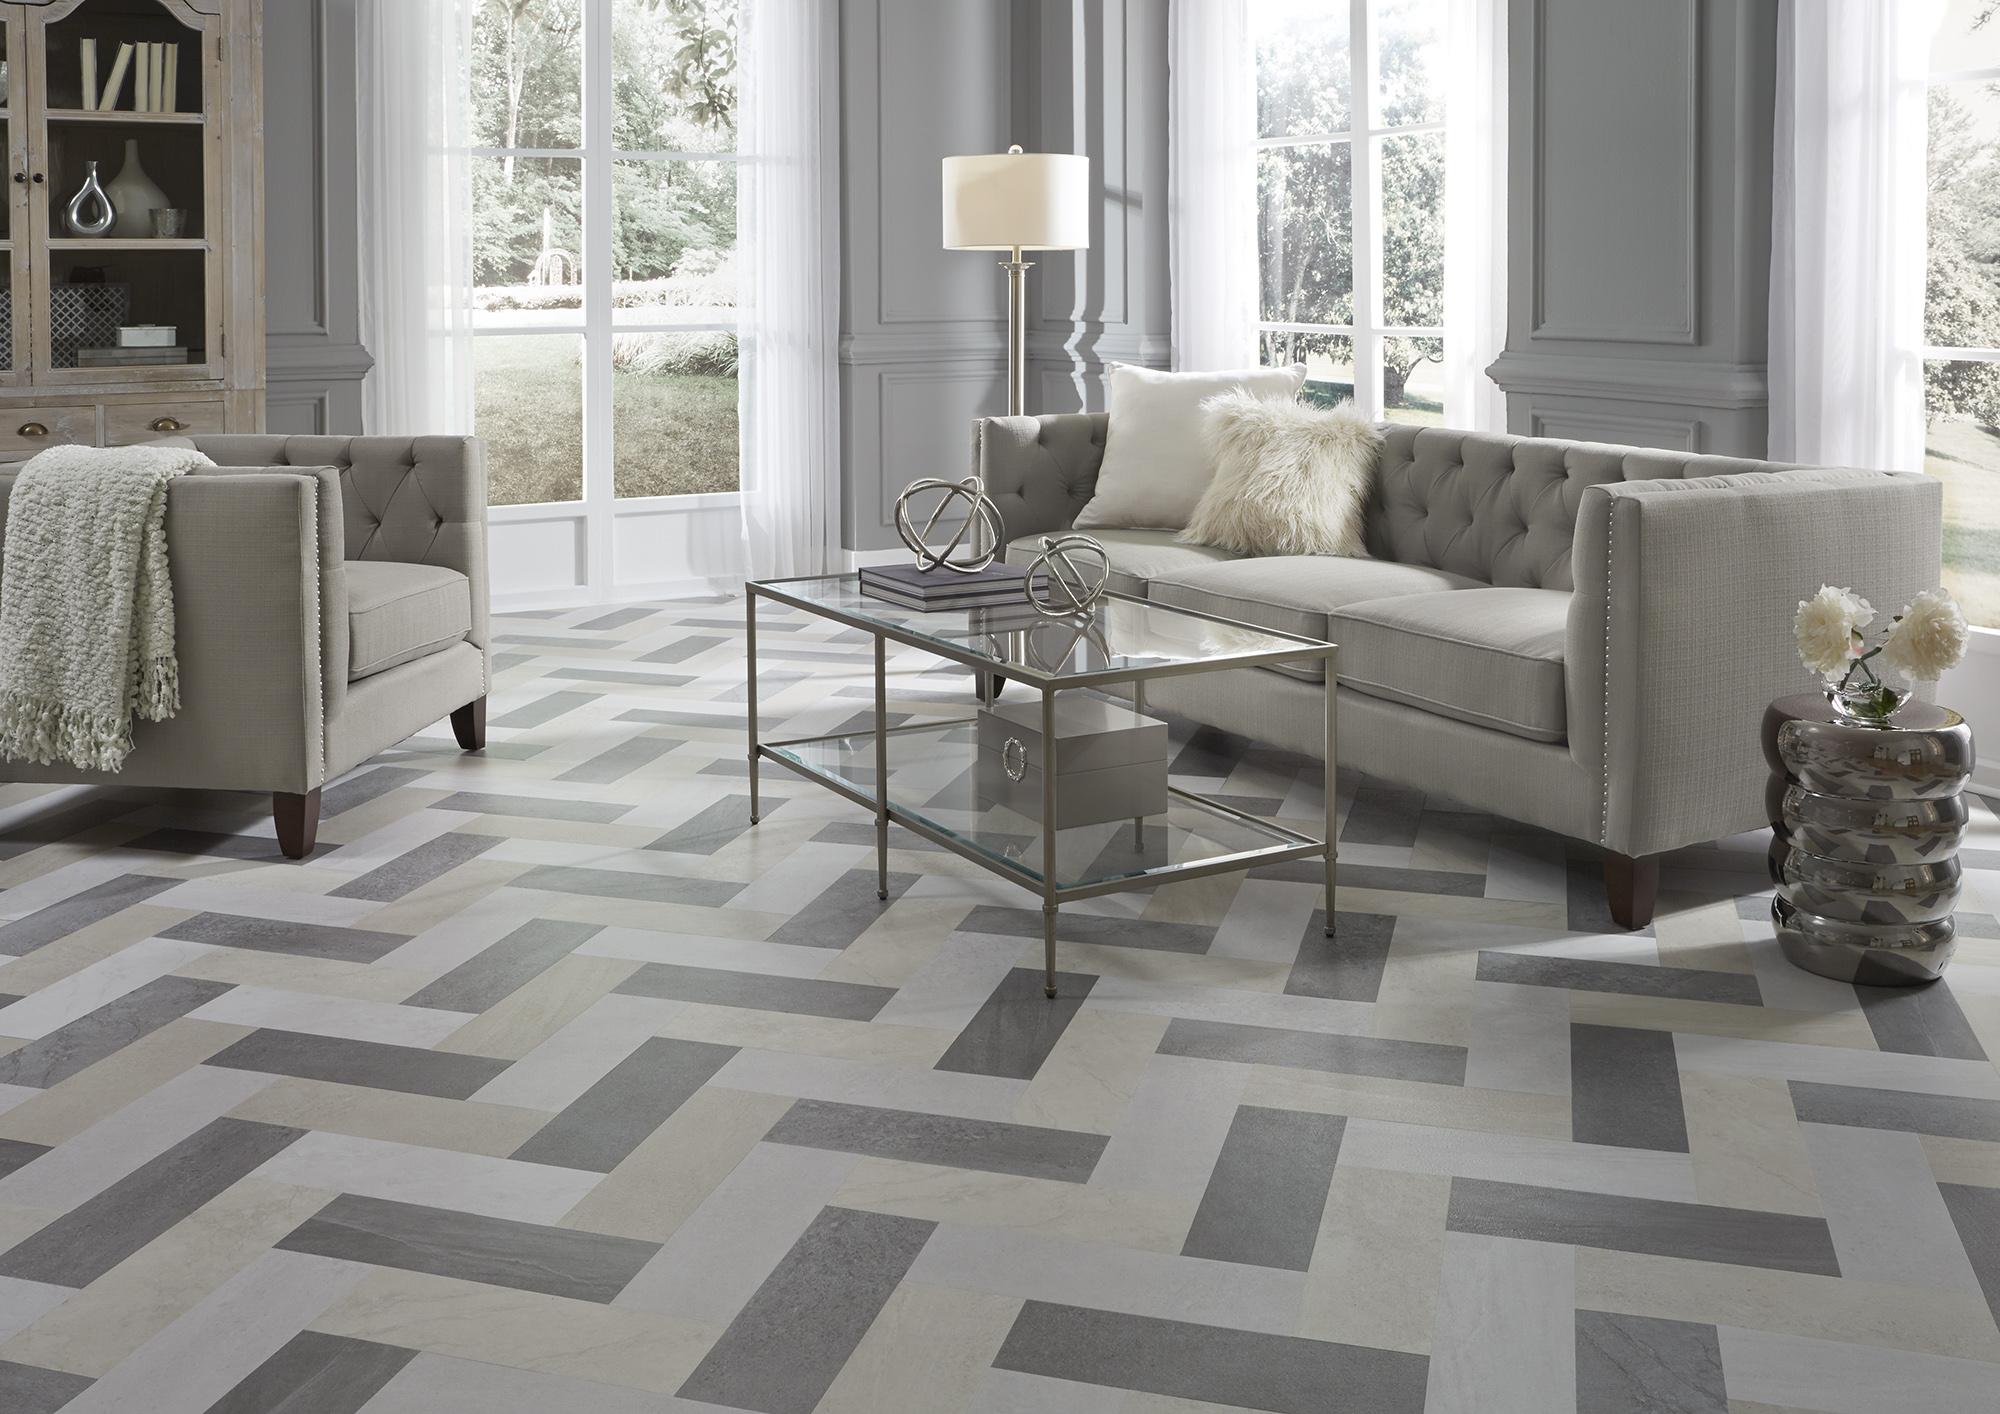 Patterned Carpet In Living Room